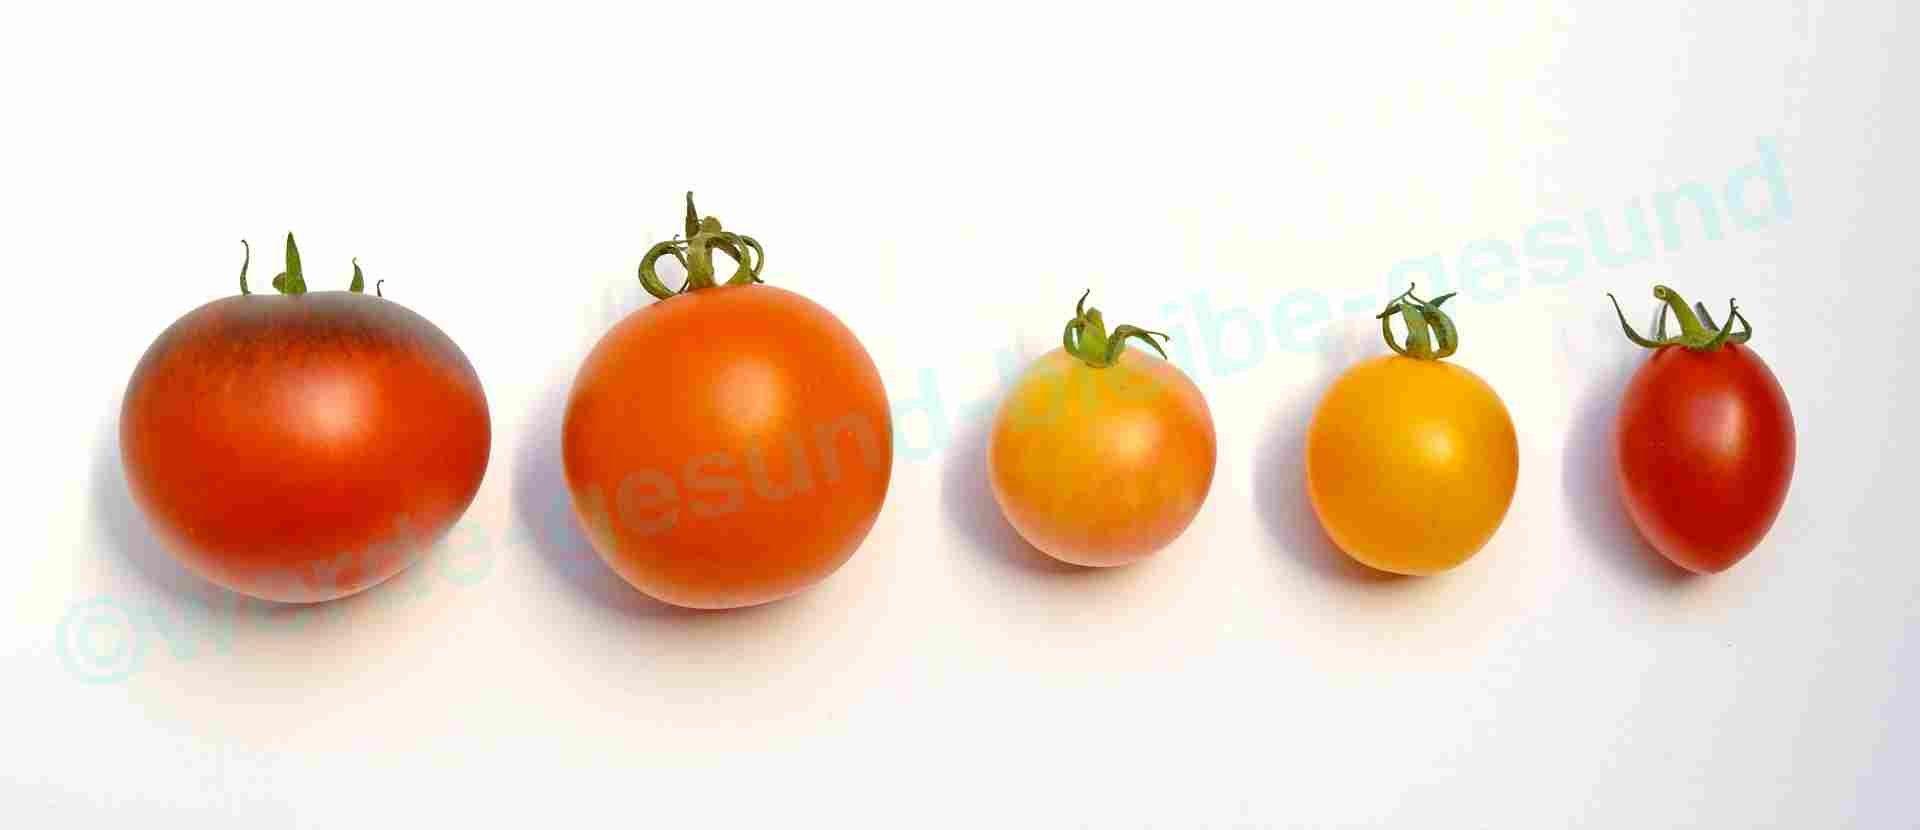 https://healt.info/wp-content/uploads/2019/05/tomatoes-Vit.cWZ_.jpg